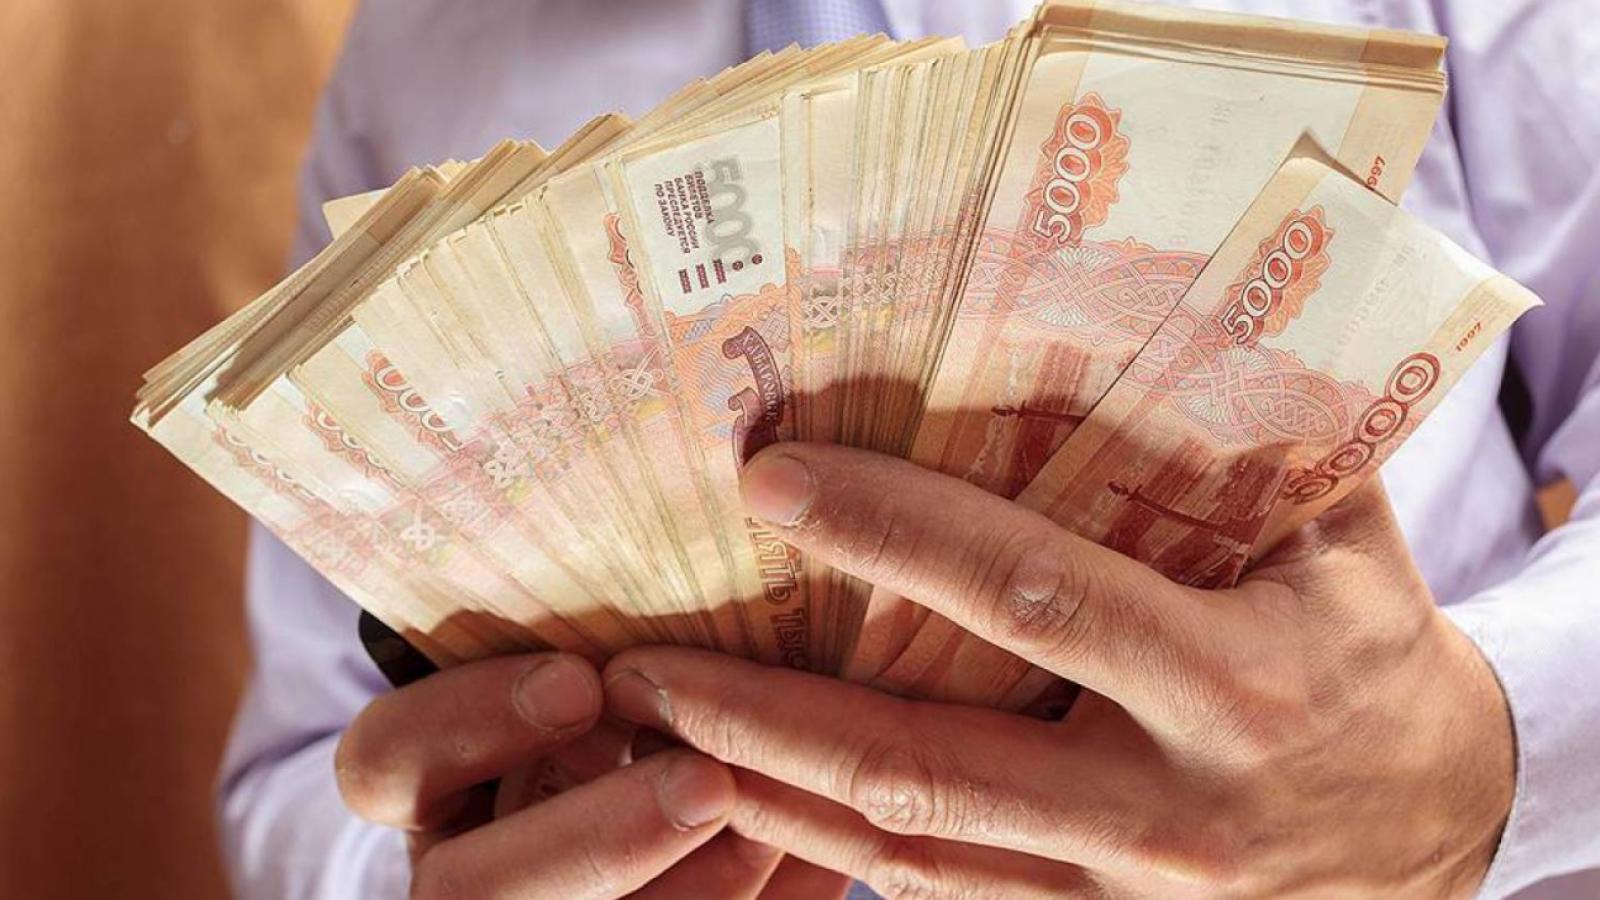 Вологодская «бизнесвумен» сколотила миллион